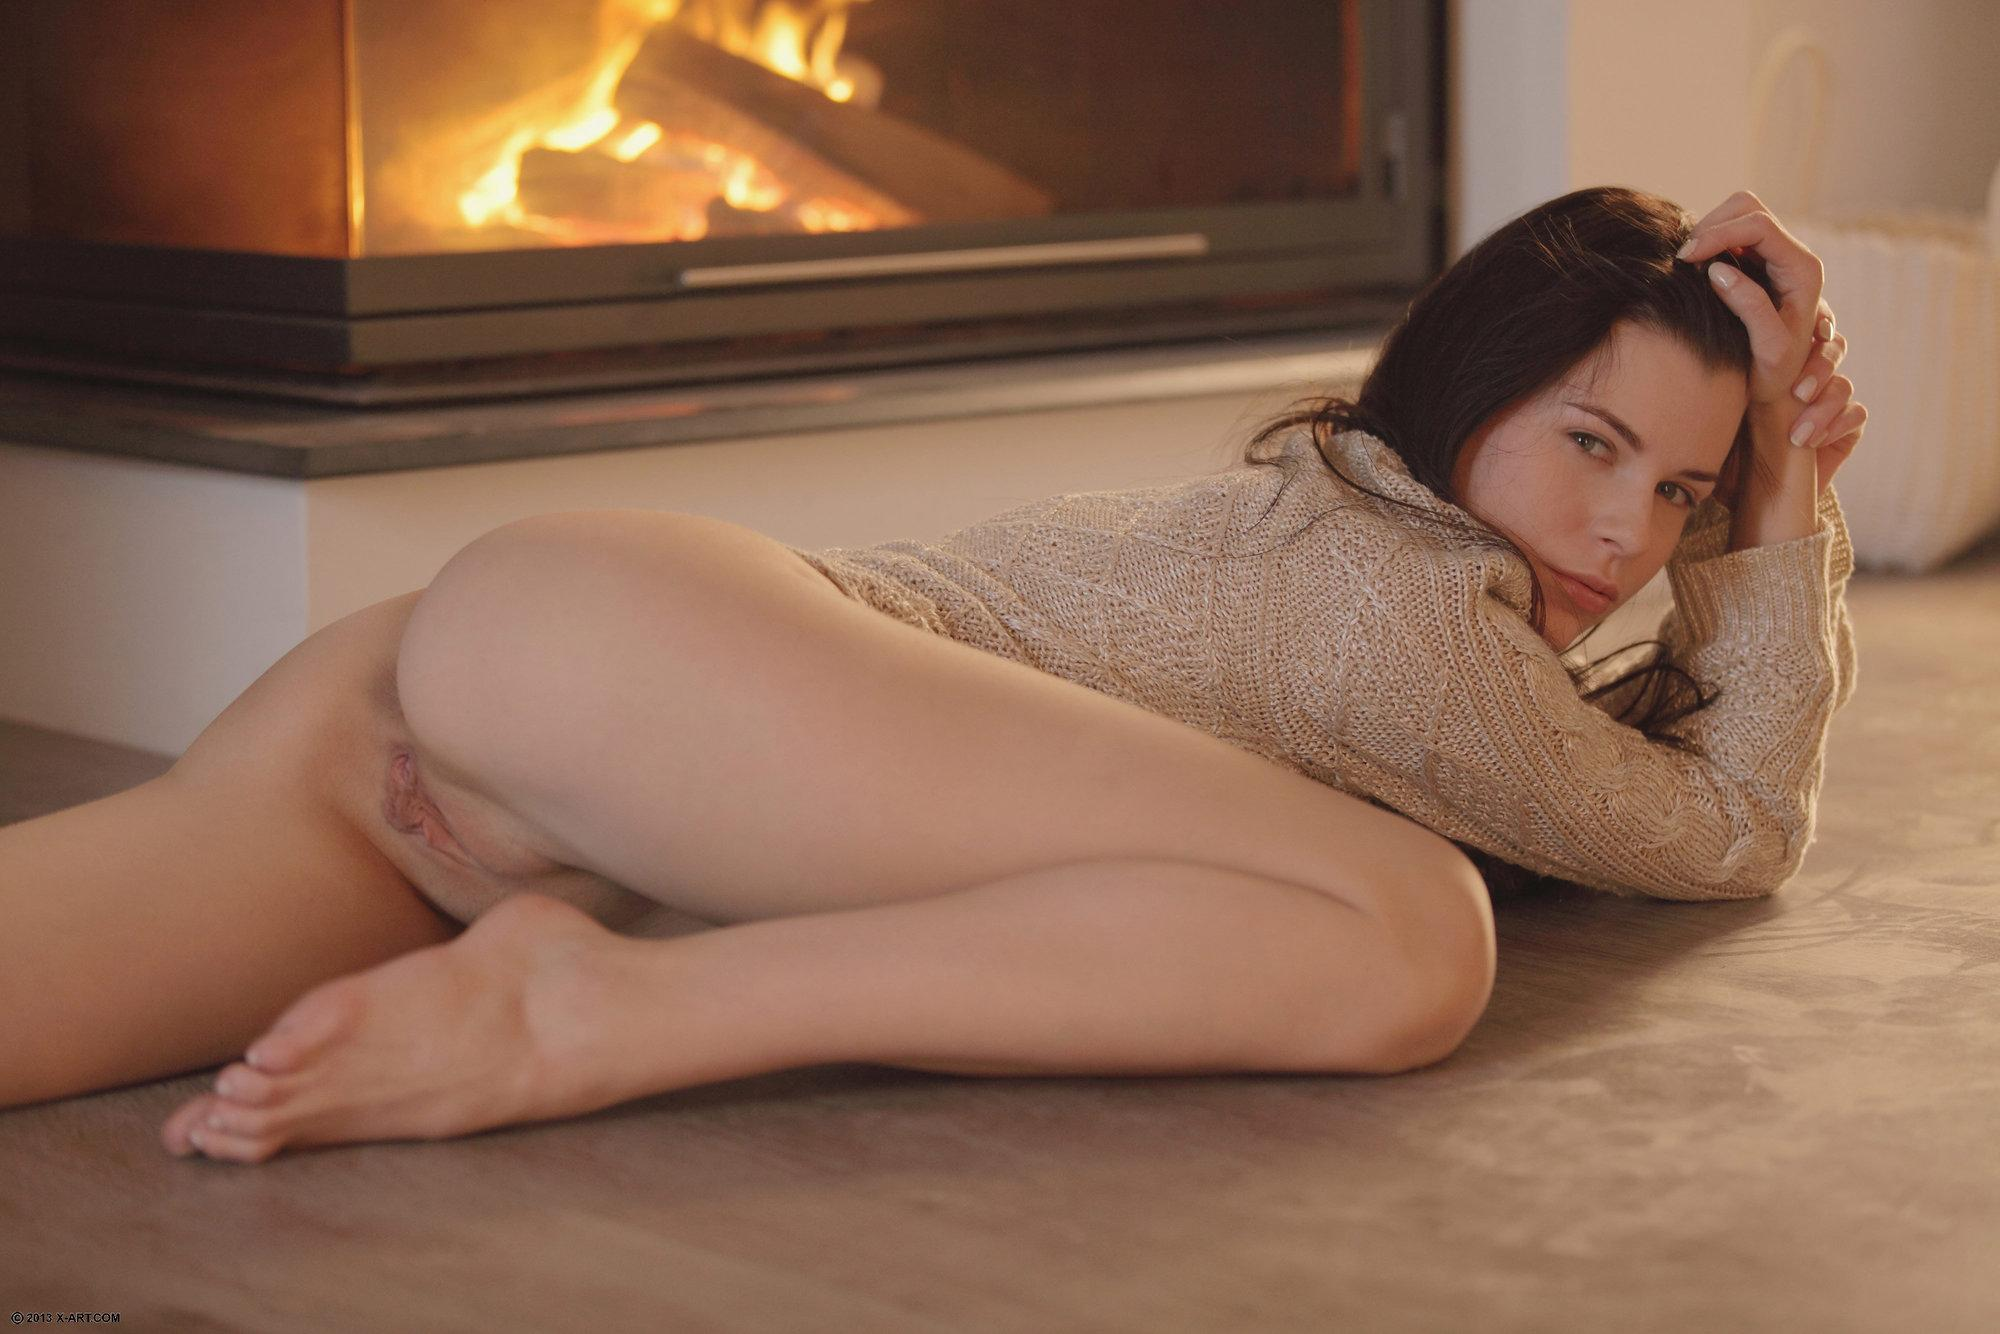 Fireplace porn